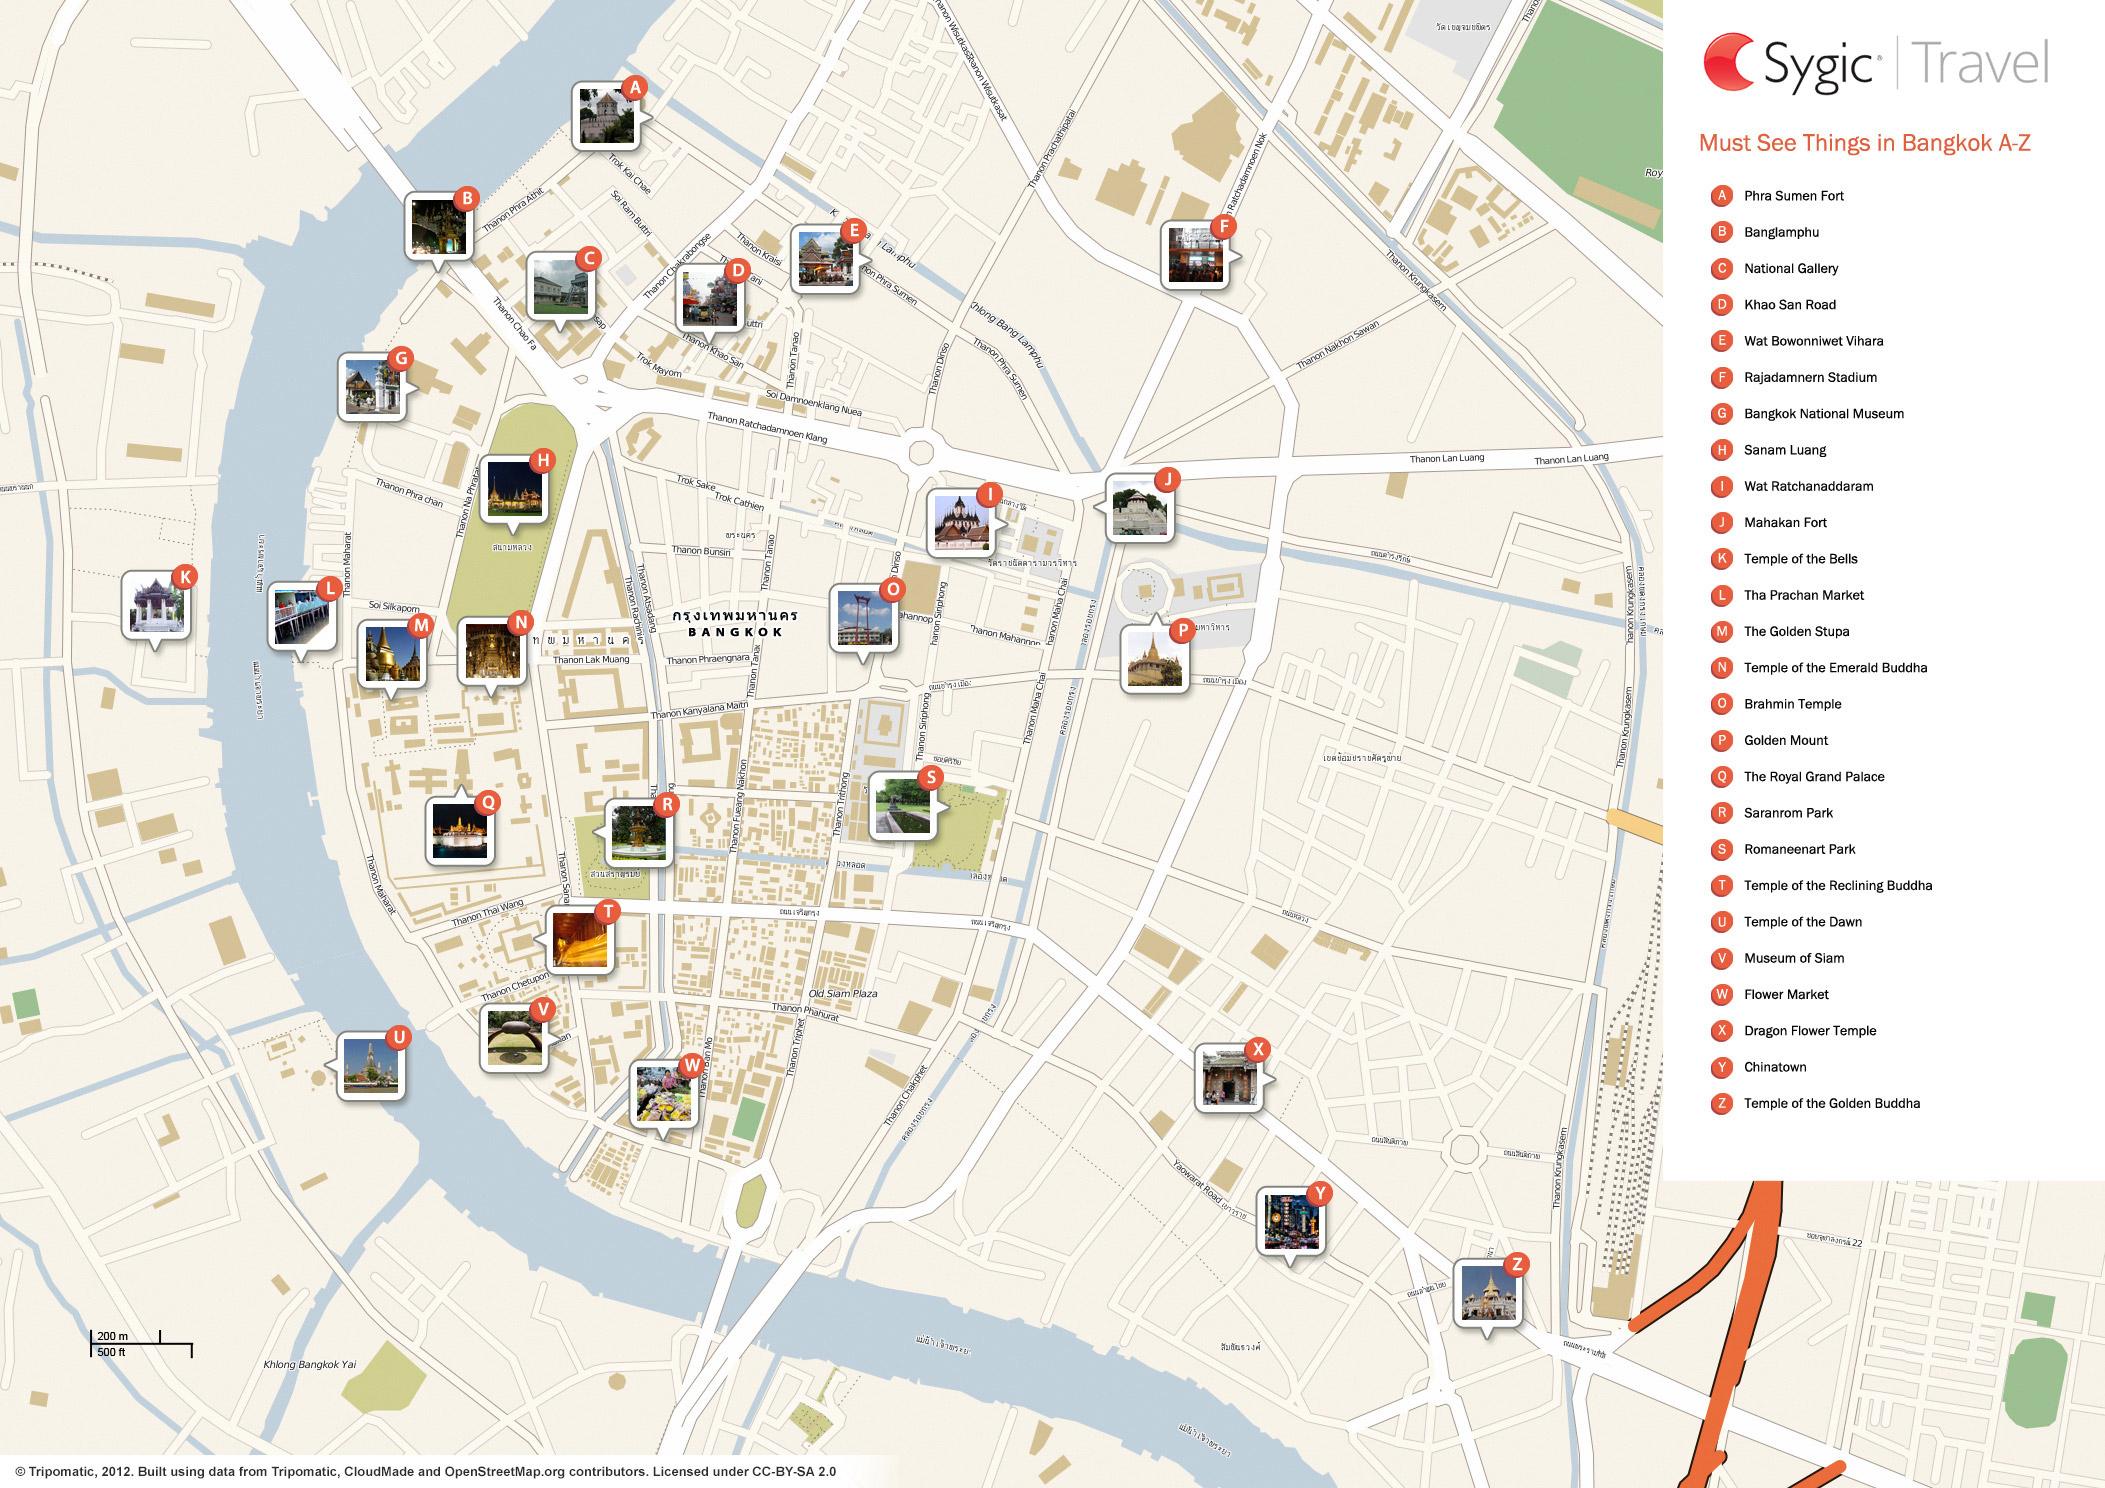 map sights